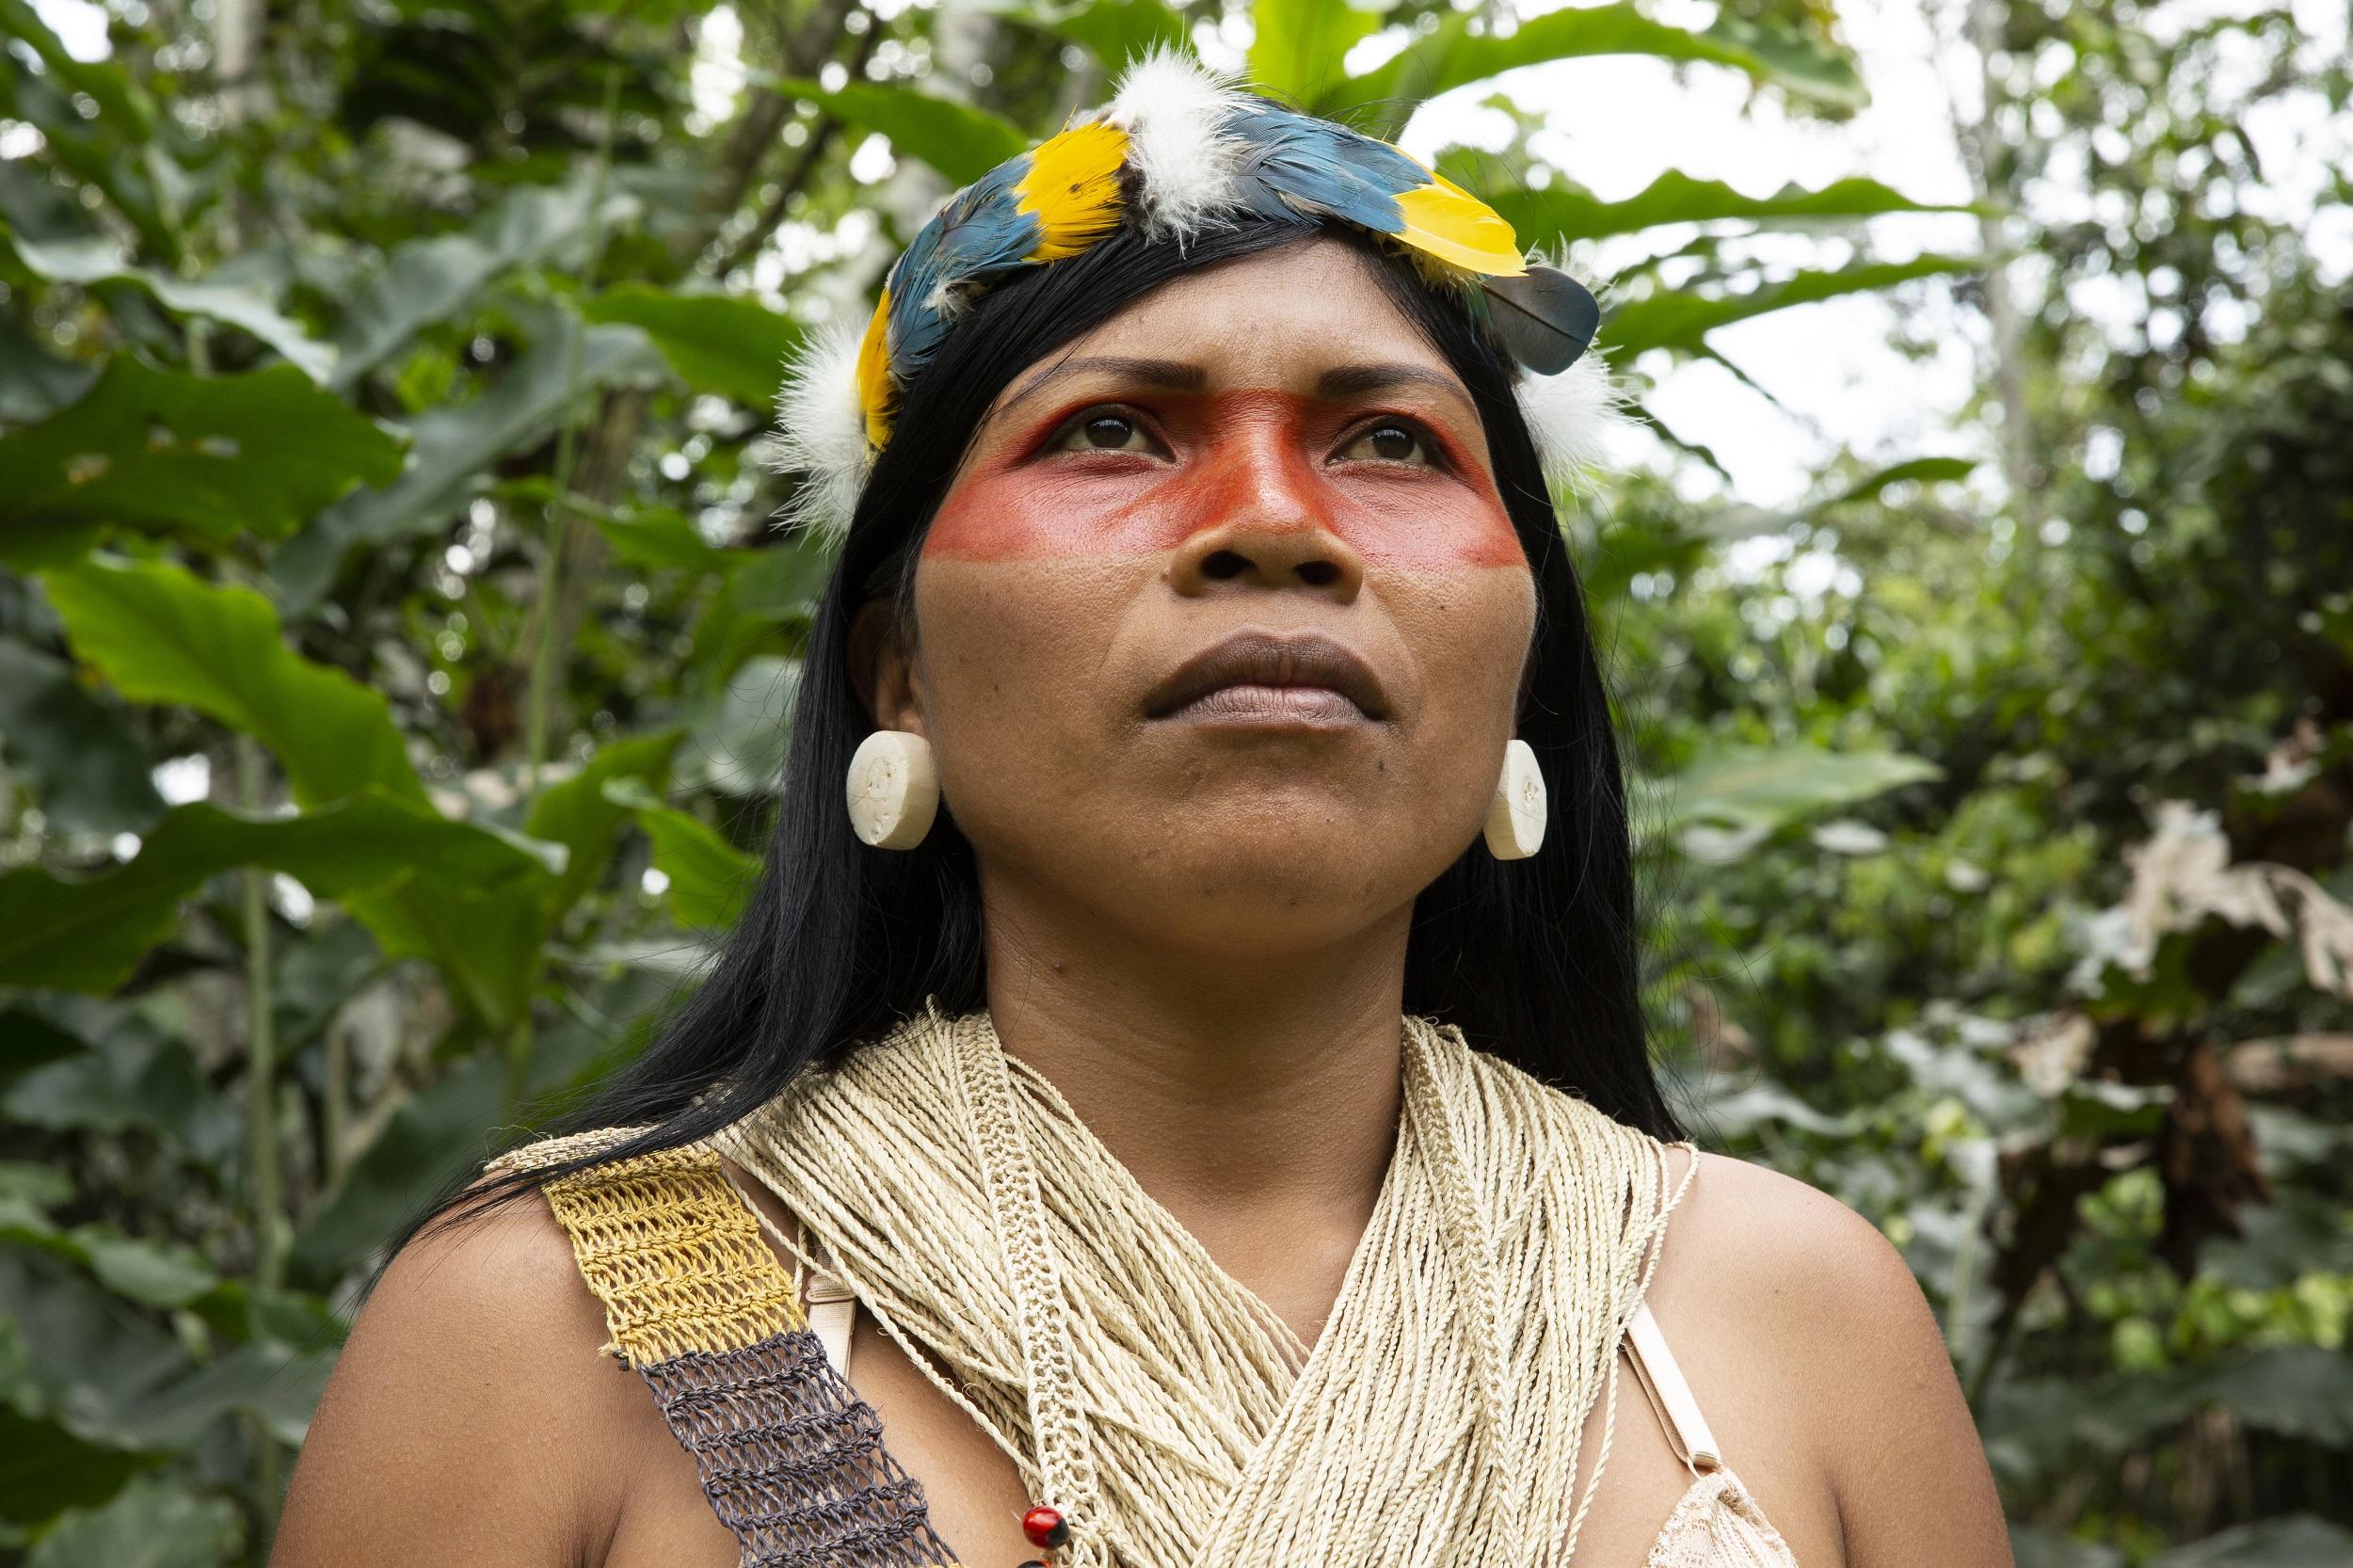 Nemonte Nenquimo, the 2020 Goldman Environmental Prize winner for South America. Image courtesy of Goldman Environmental Prize.